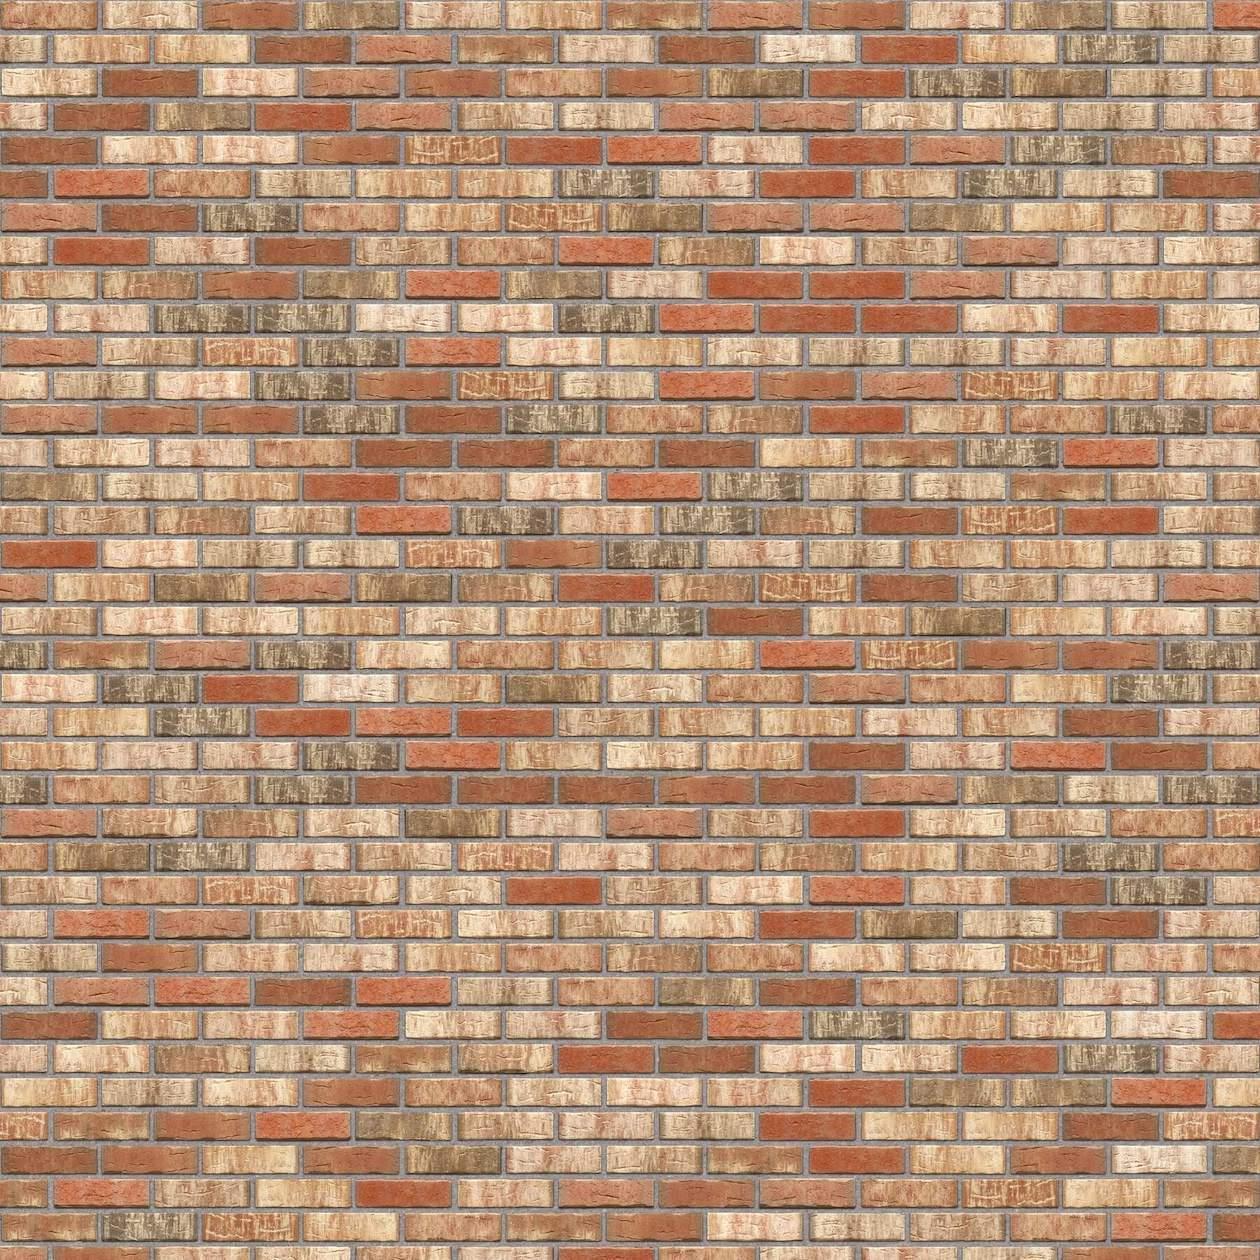 Puna-cigla-FeldHaus-Klinker-brick-house-nf-k-690-Siva Fuga